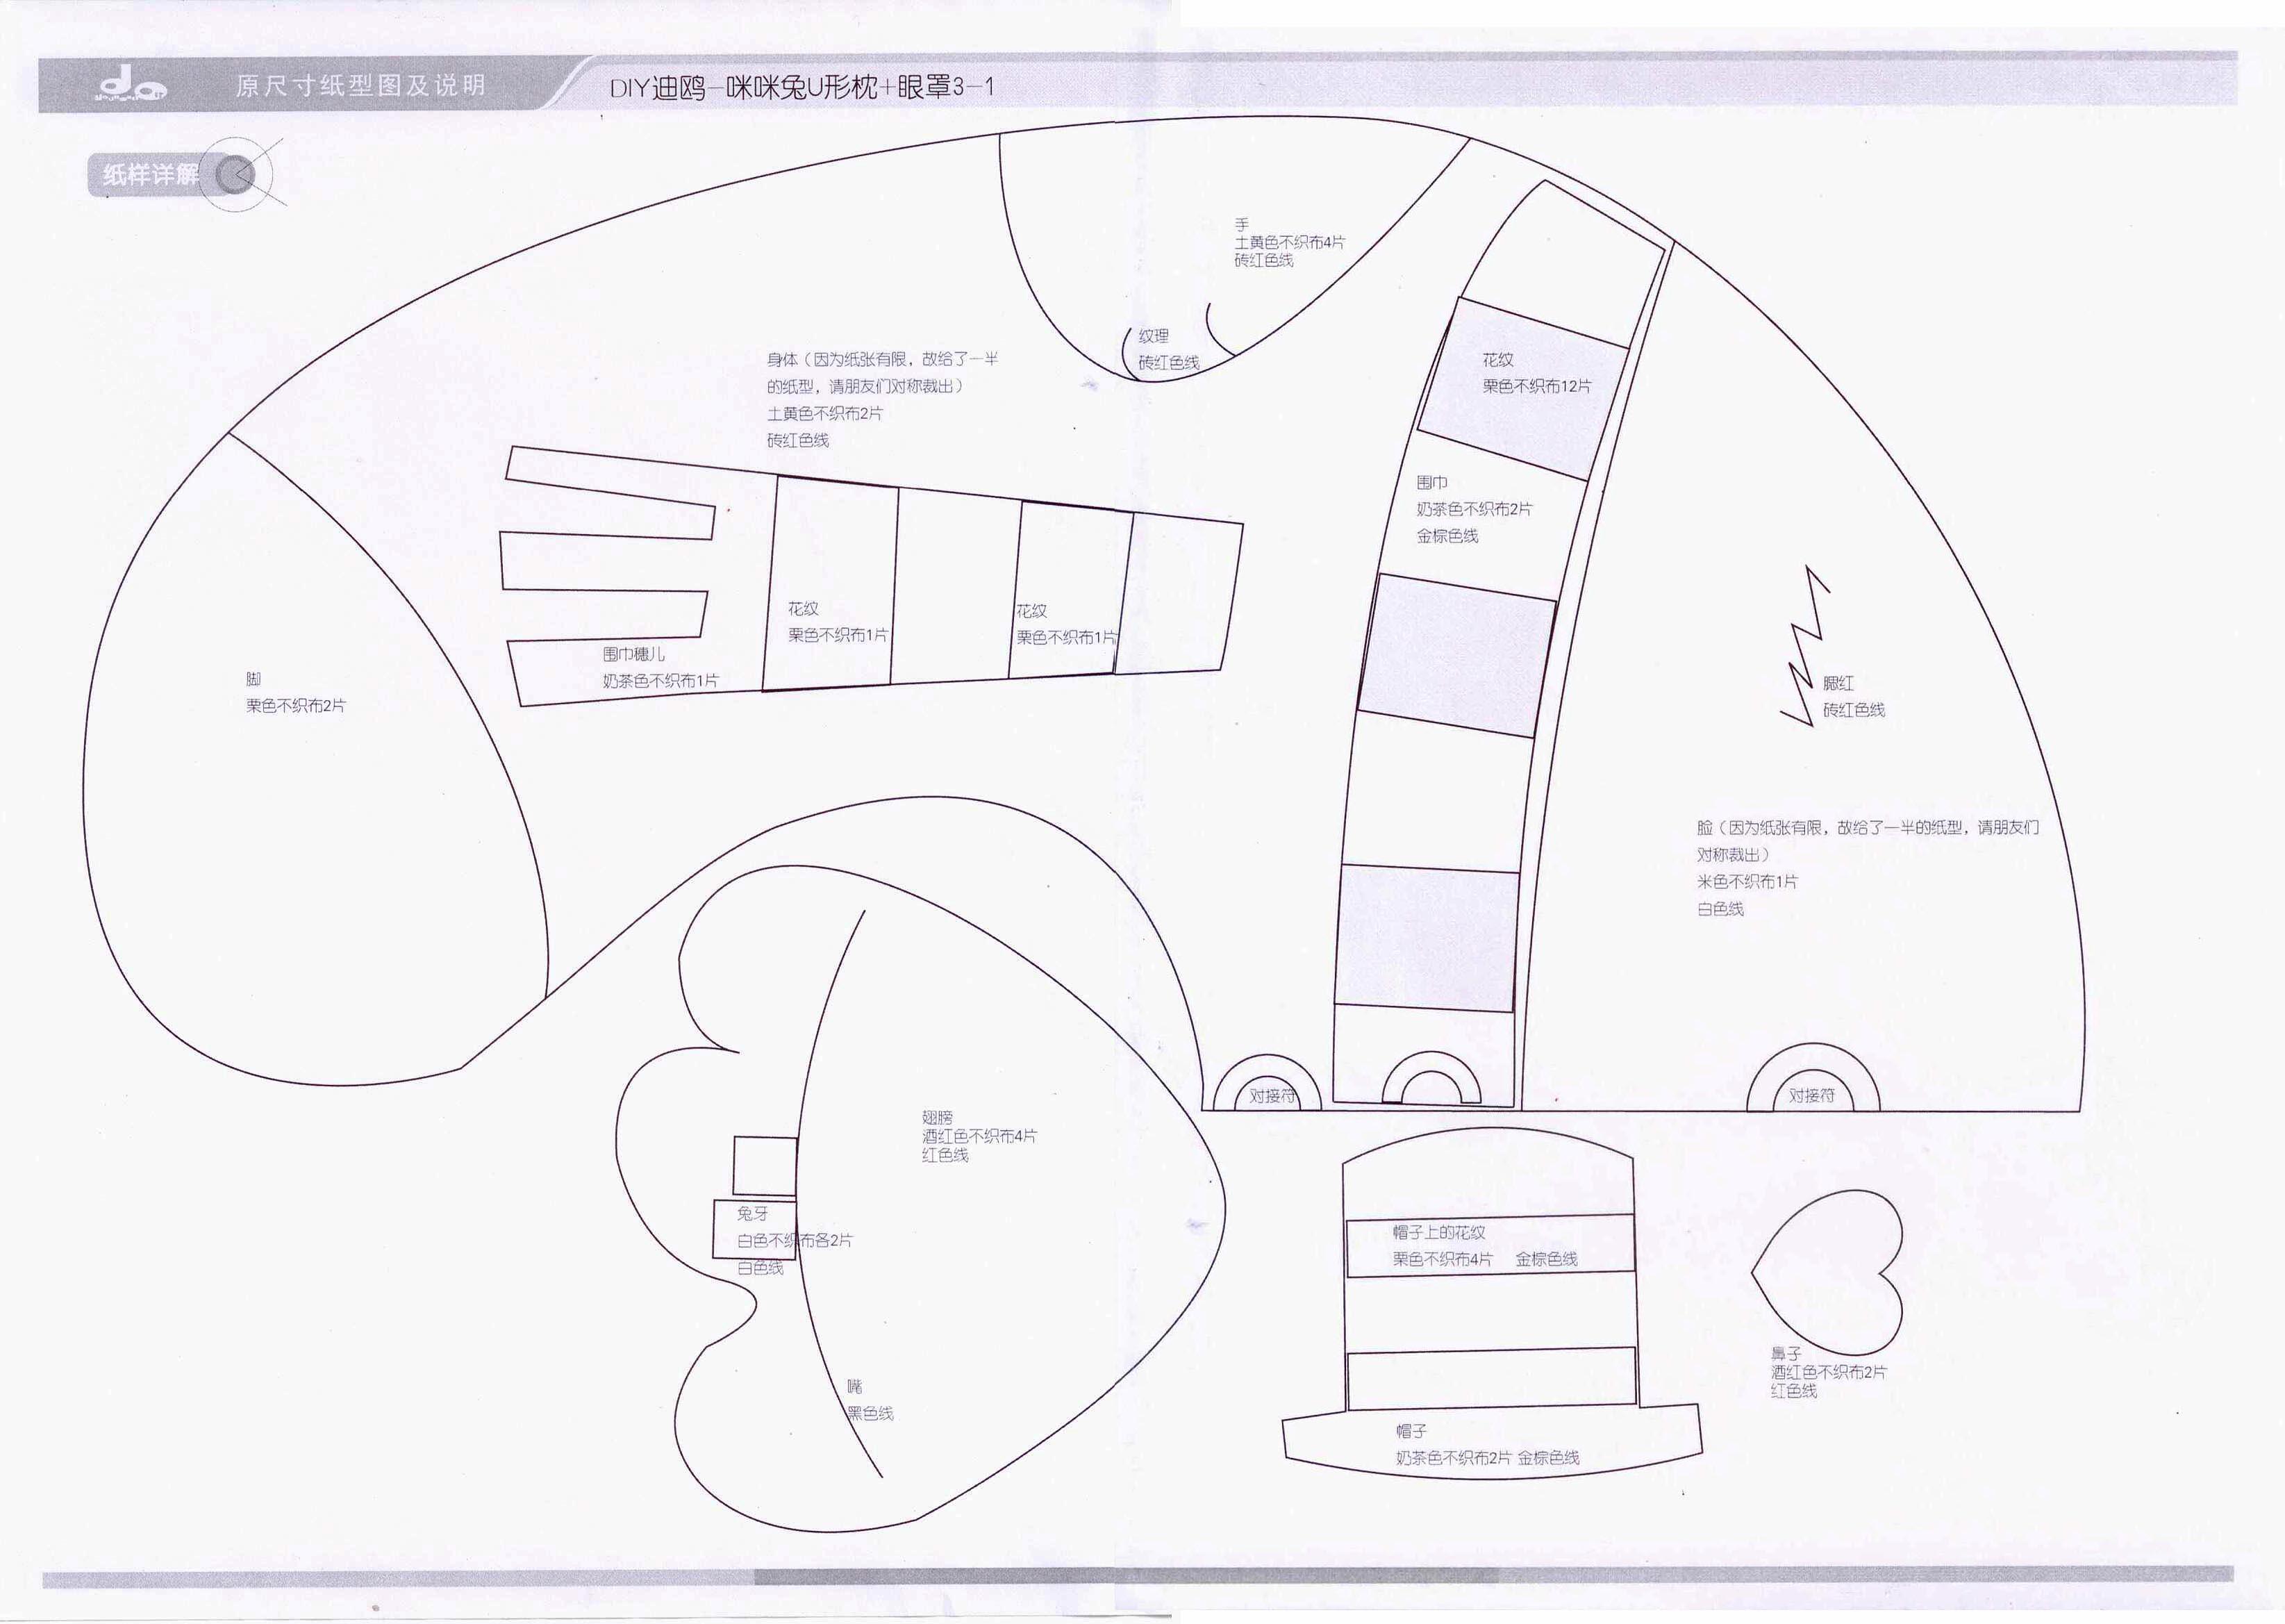 16.5cm口金包图纸_16.5cm口金包分头图片螺丝图纸图纸图片